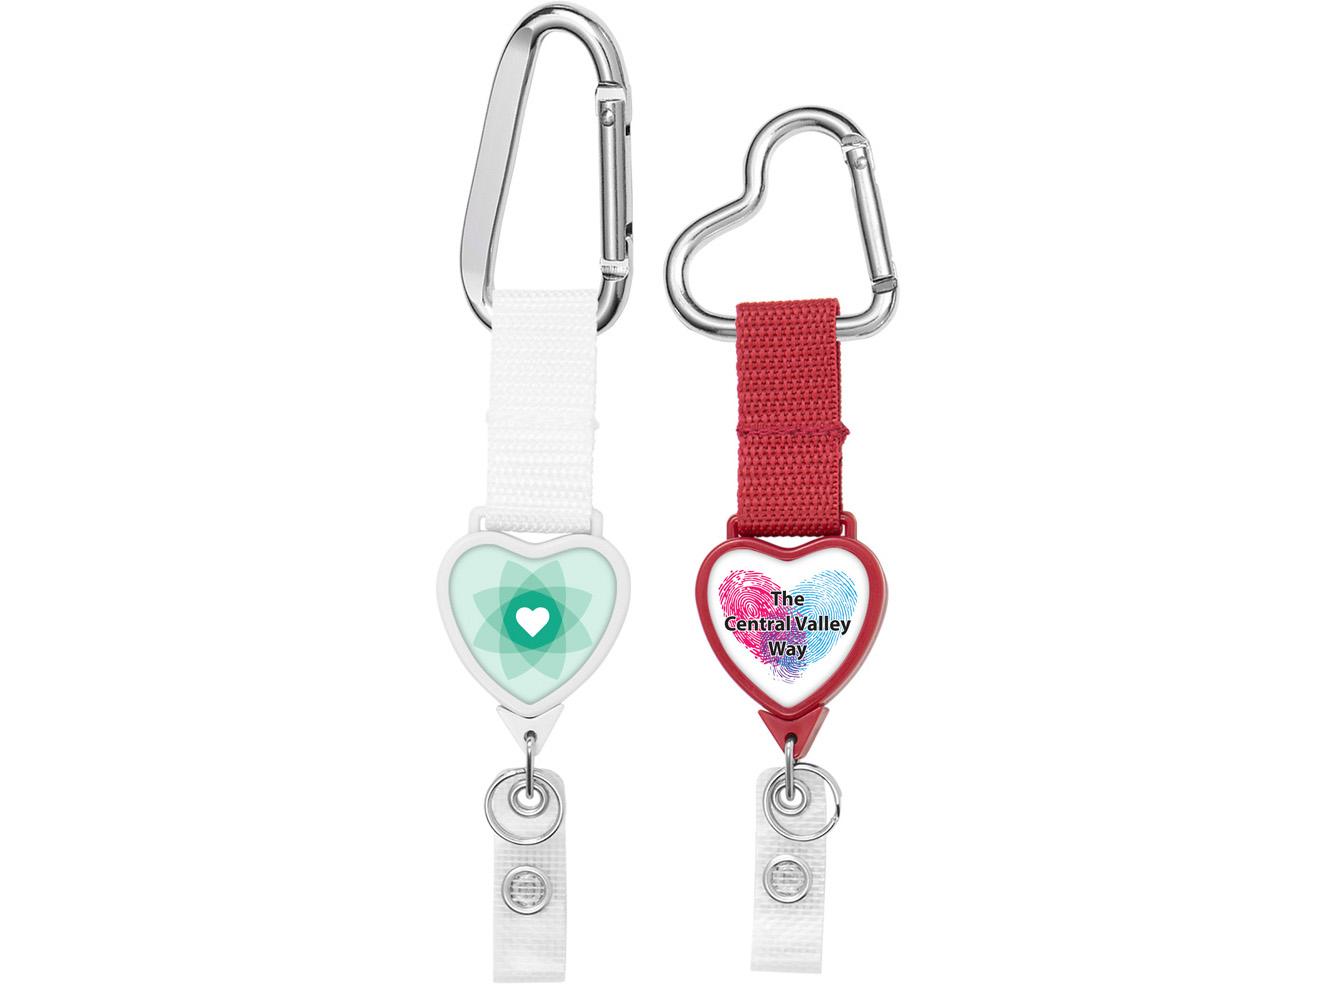 BH999: Heart Carabiner Strap 2 Reel